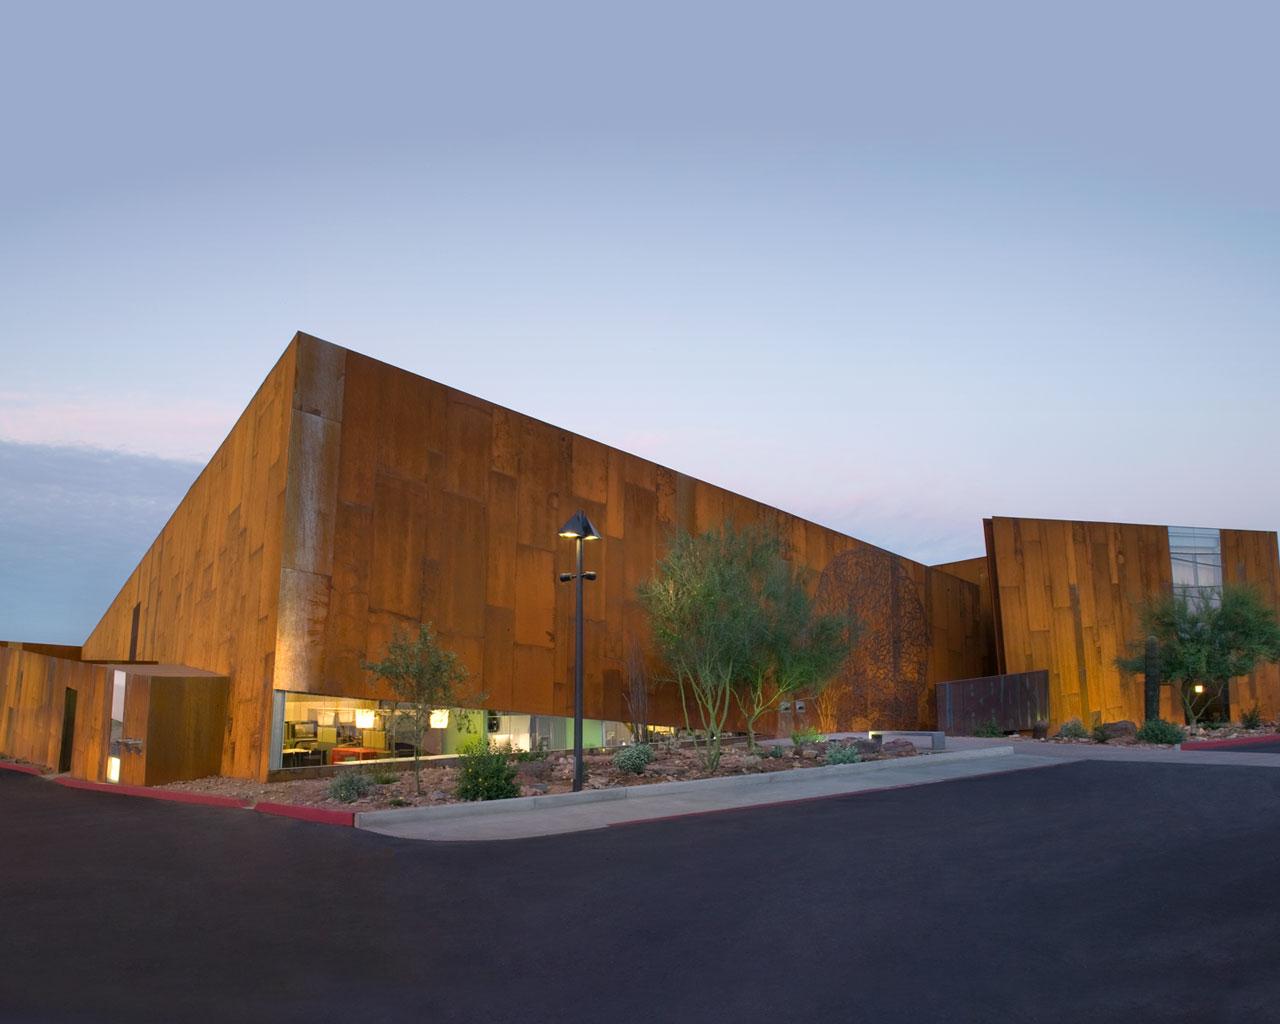 Arabian Library In Scottsdale Arizona